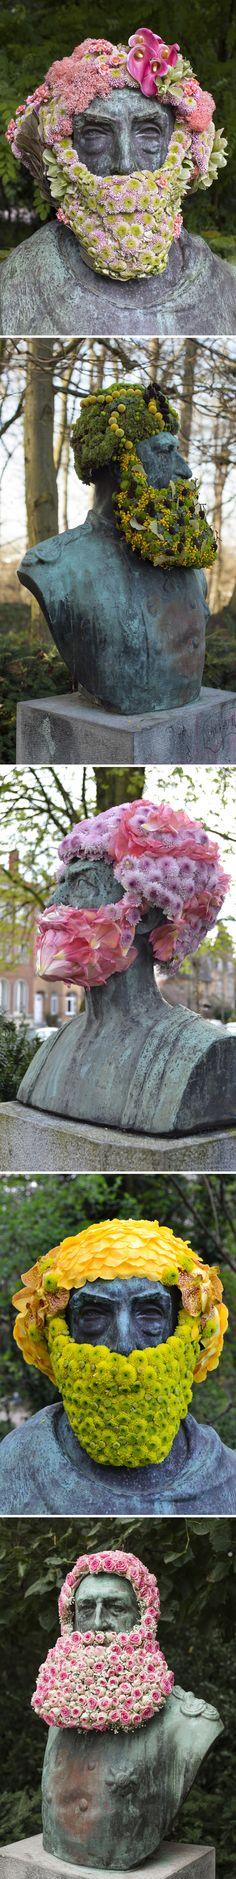 The Jealous Curator /// curated contemporary art /// geoffroy mottart Art Floral, Photomontage, Illustrations, Illustration Art, Street Art, Flower Bomb, Flower Art, Church Architecture, Public Art